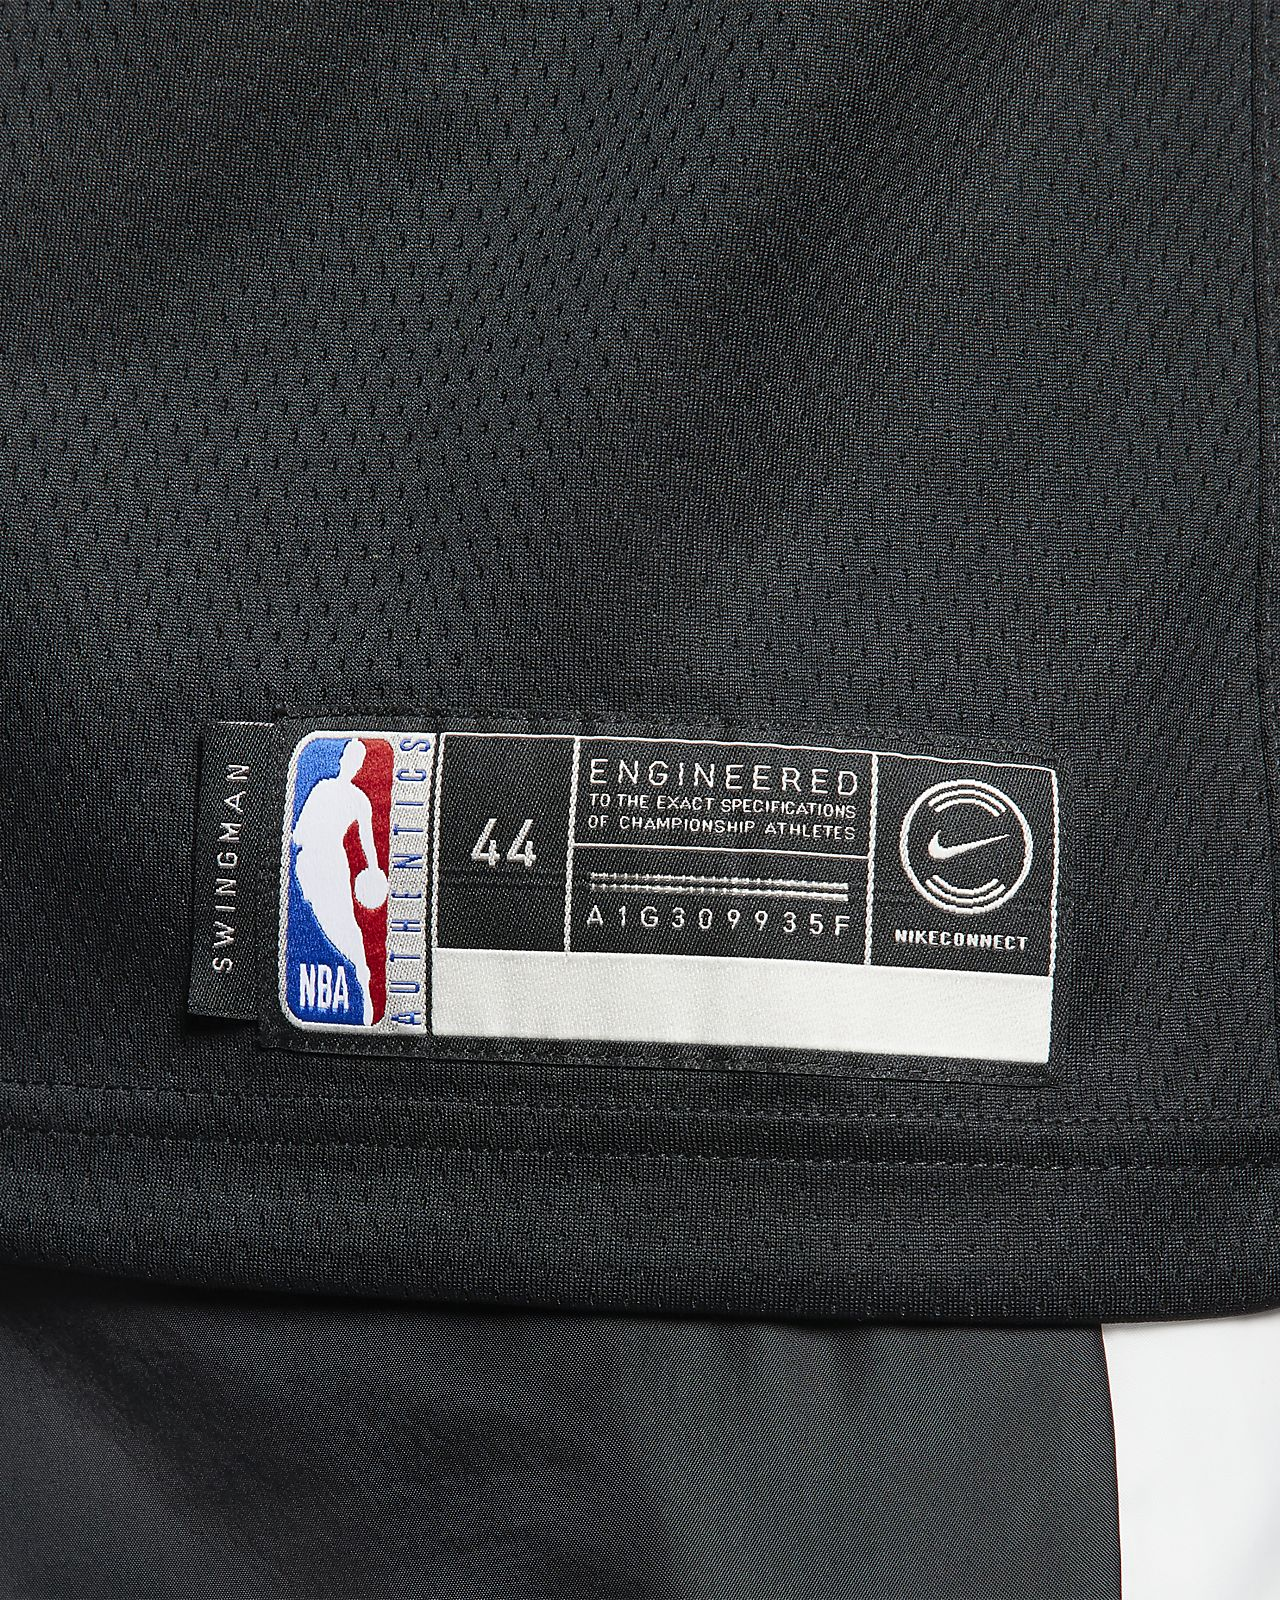 1fef53223e4 ... Zach LaVine City Edition Swingman (Chicago Bulls) Men s Nike NBA  Connected Jersey